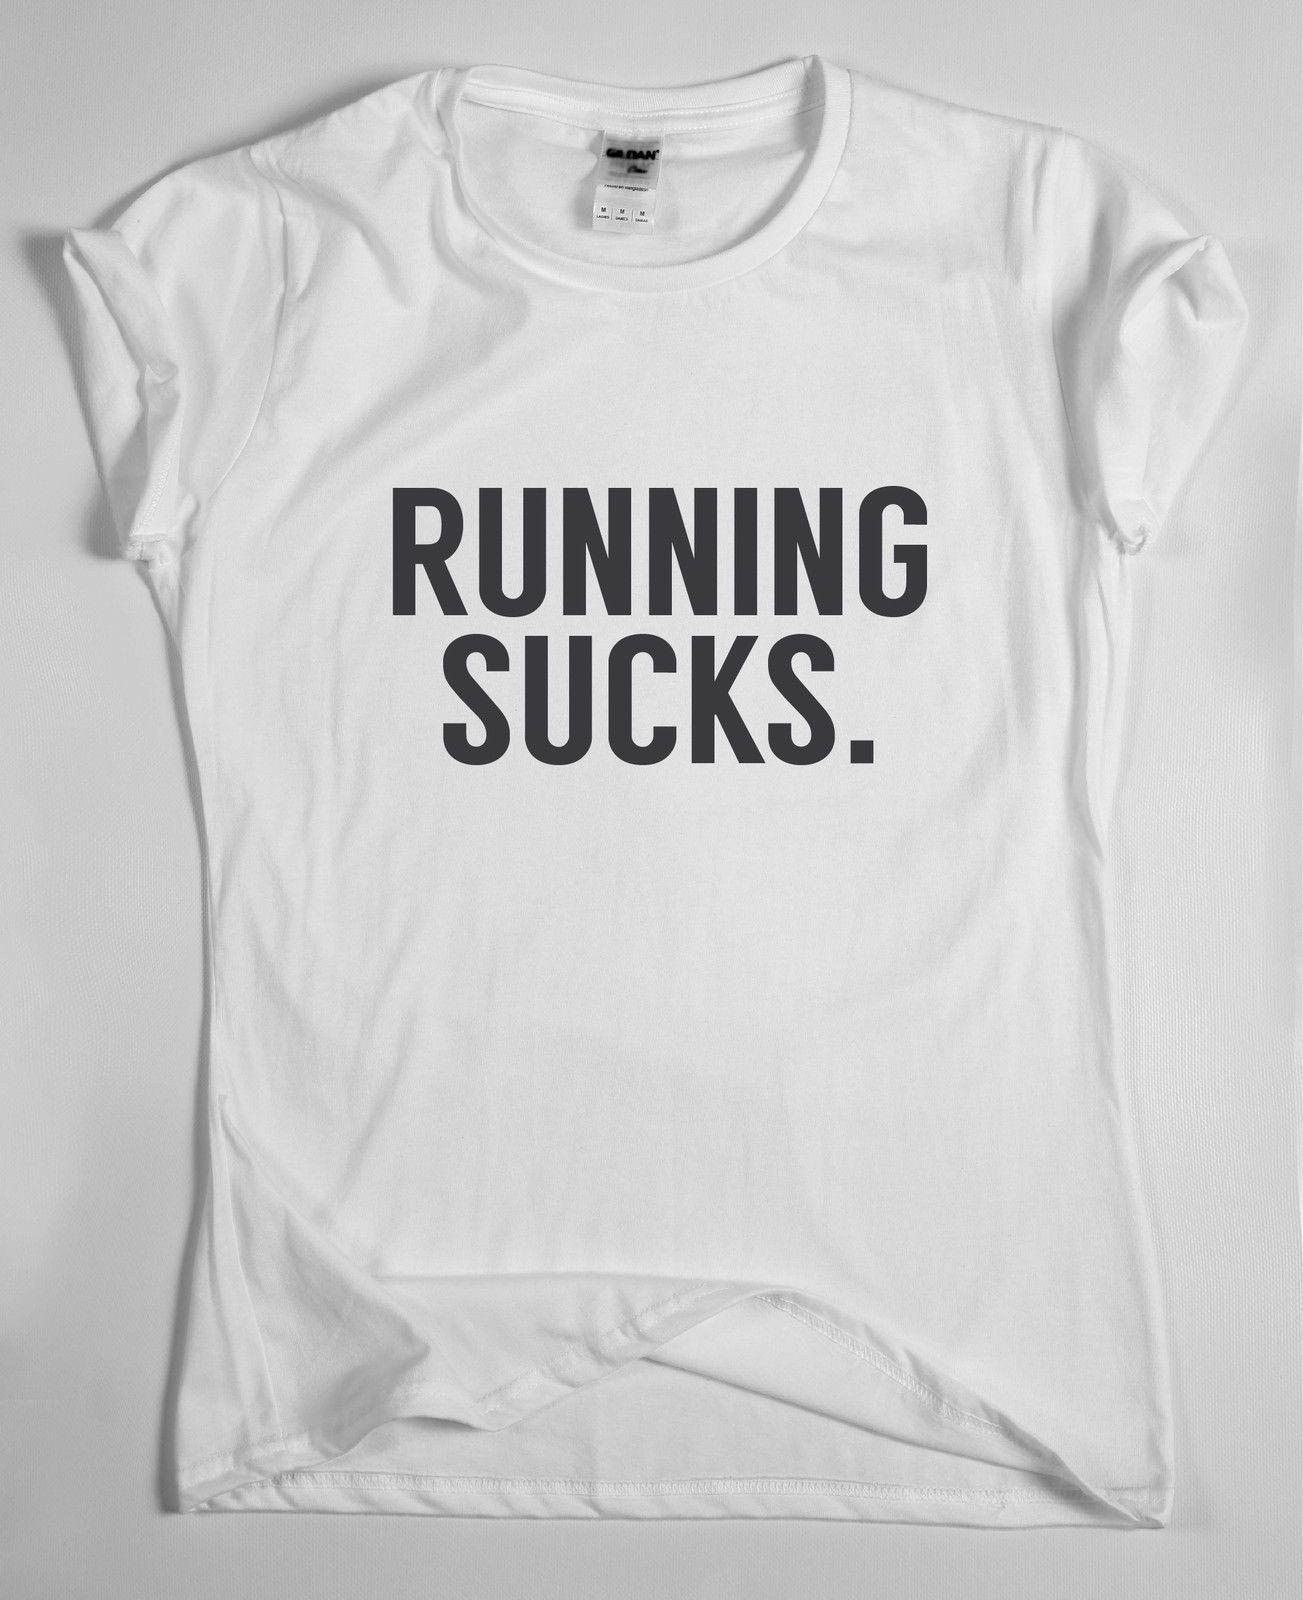 8de859bb Running Sucks T Shirt Tee Sport Mens Womens Football Uni Lad Funny Unisex  Casual Tshirt Top T Shirt Sayings Retro T Shirt From Redleaderclothing, ...